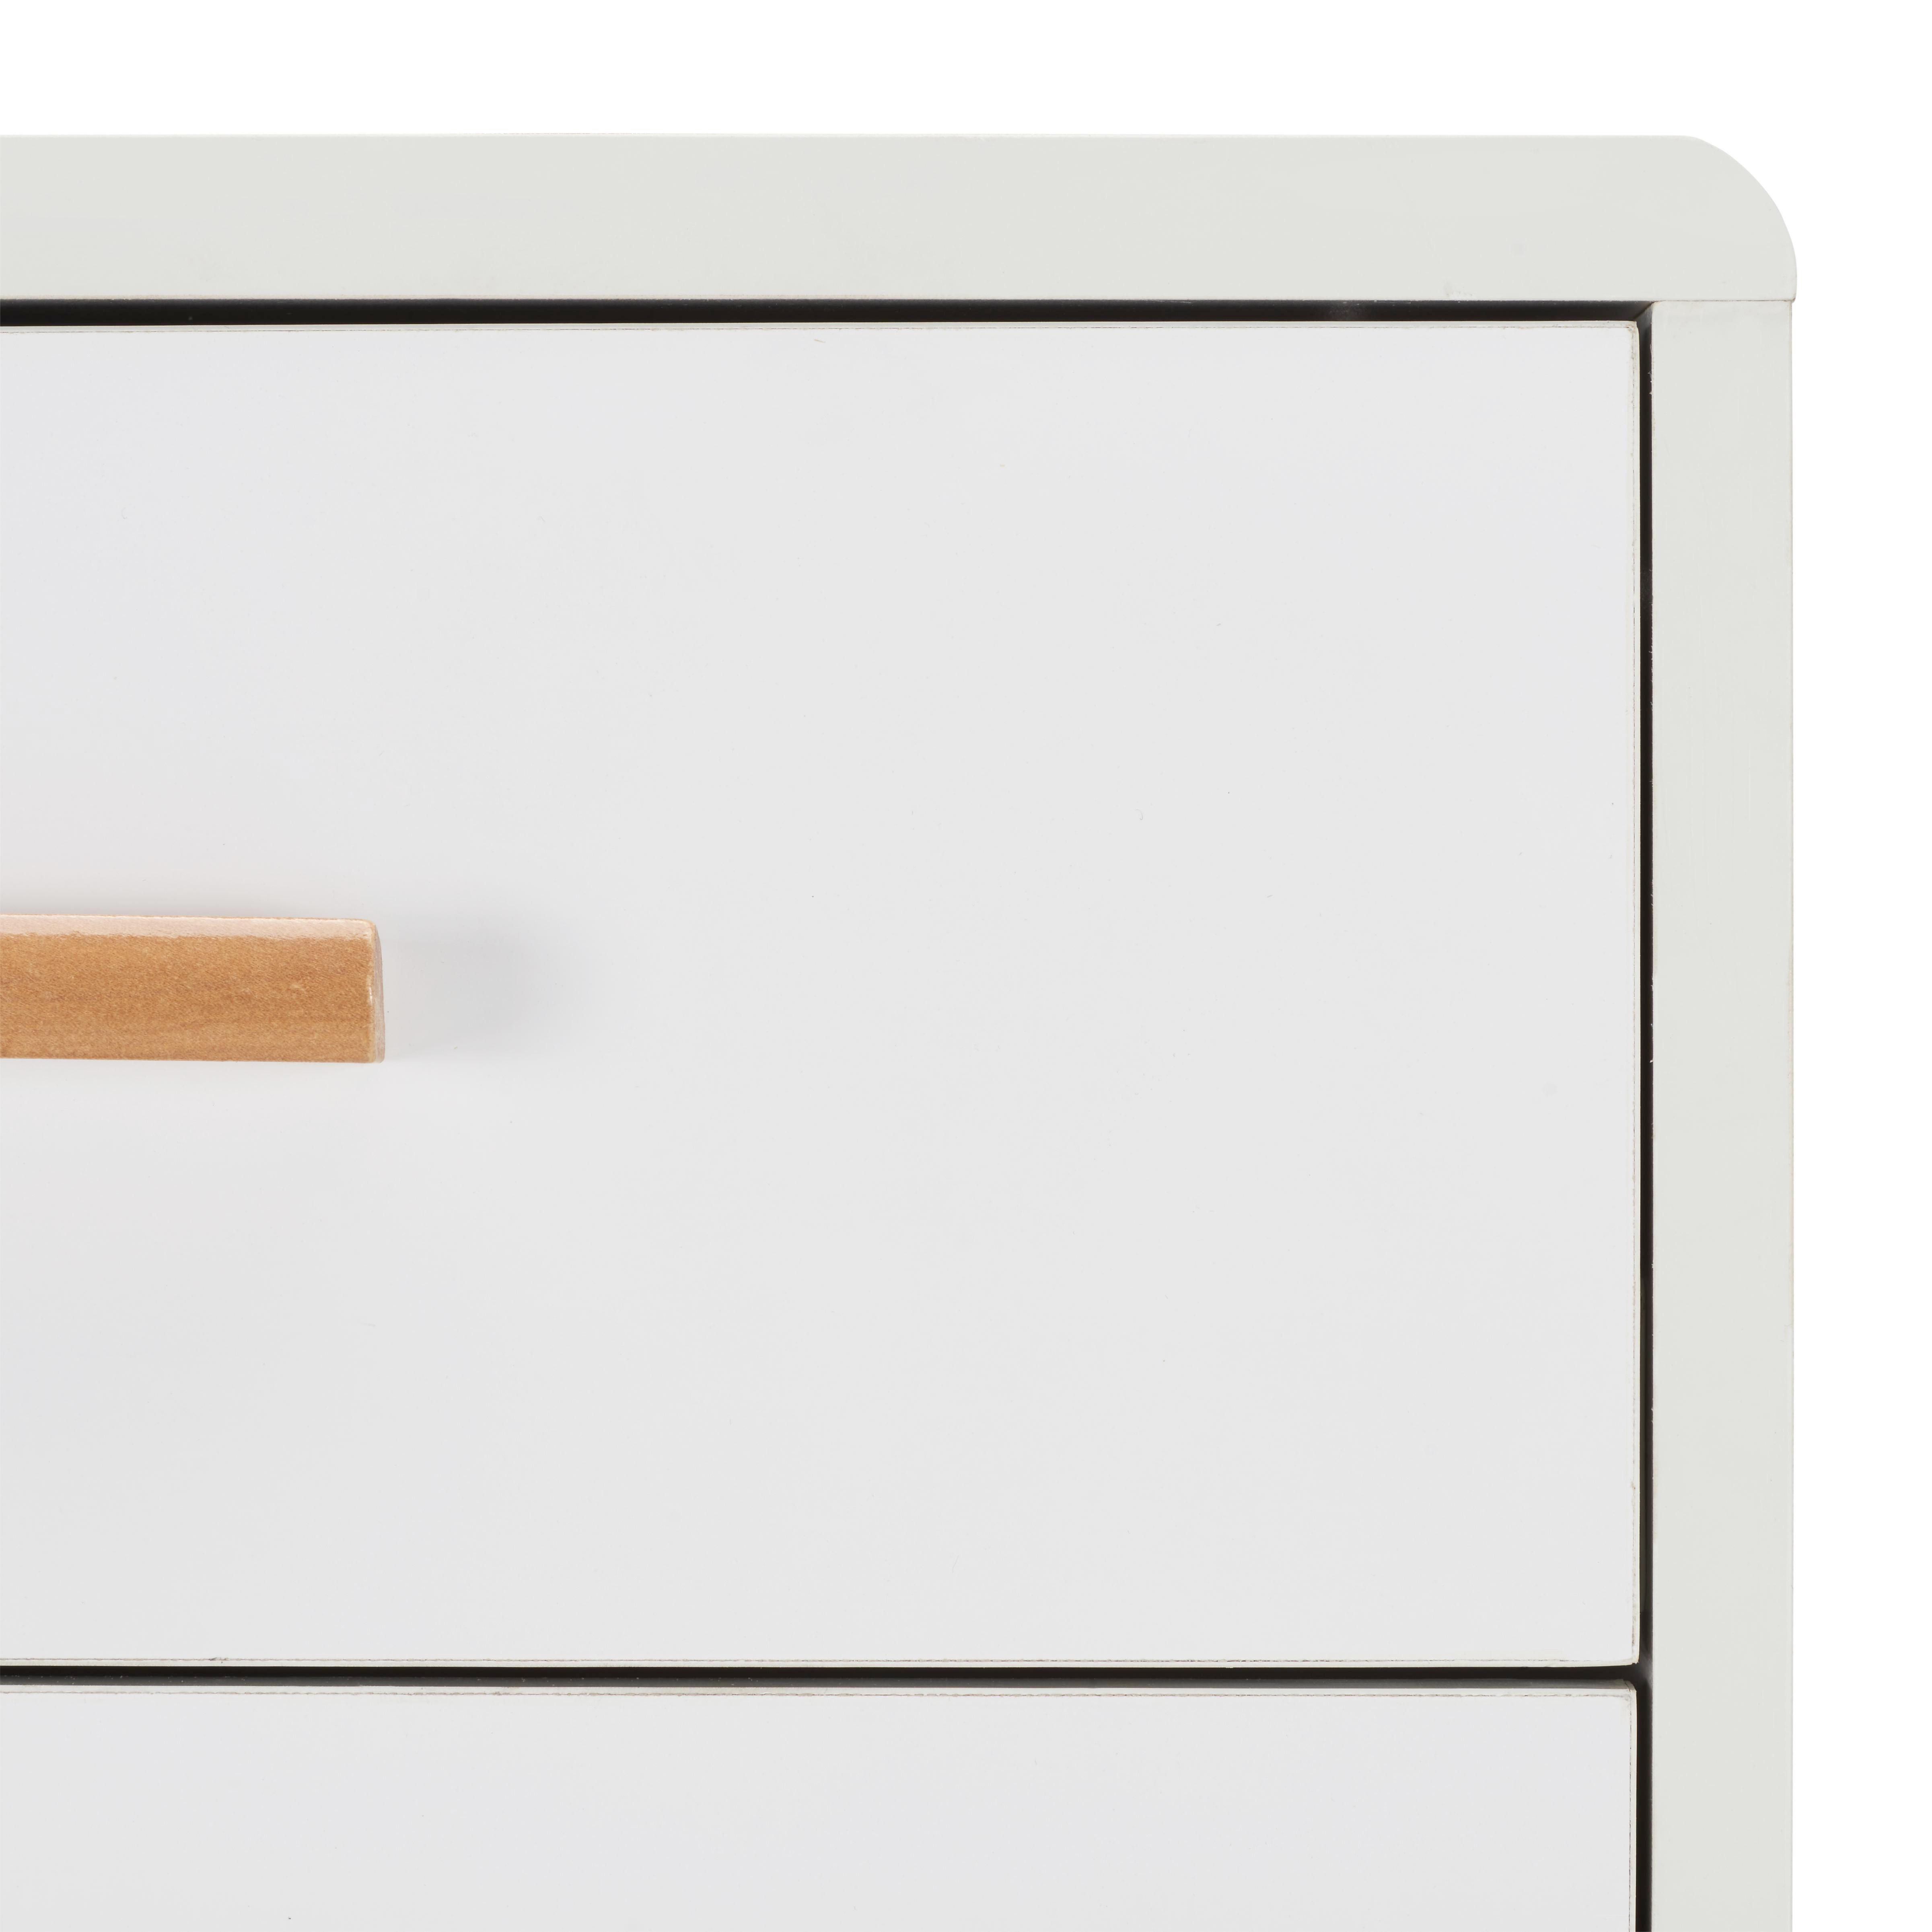 Kommode Claire - Braun/Weiß, MODERN, Holz (40/100/39cm) - MÖMAX modern living